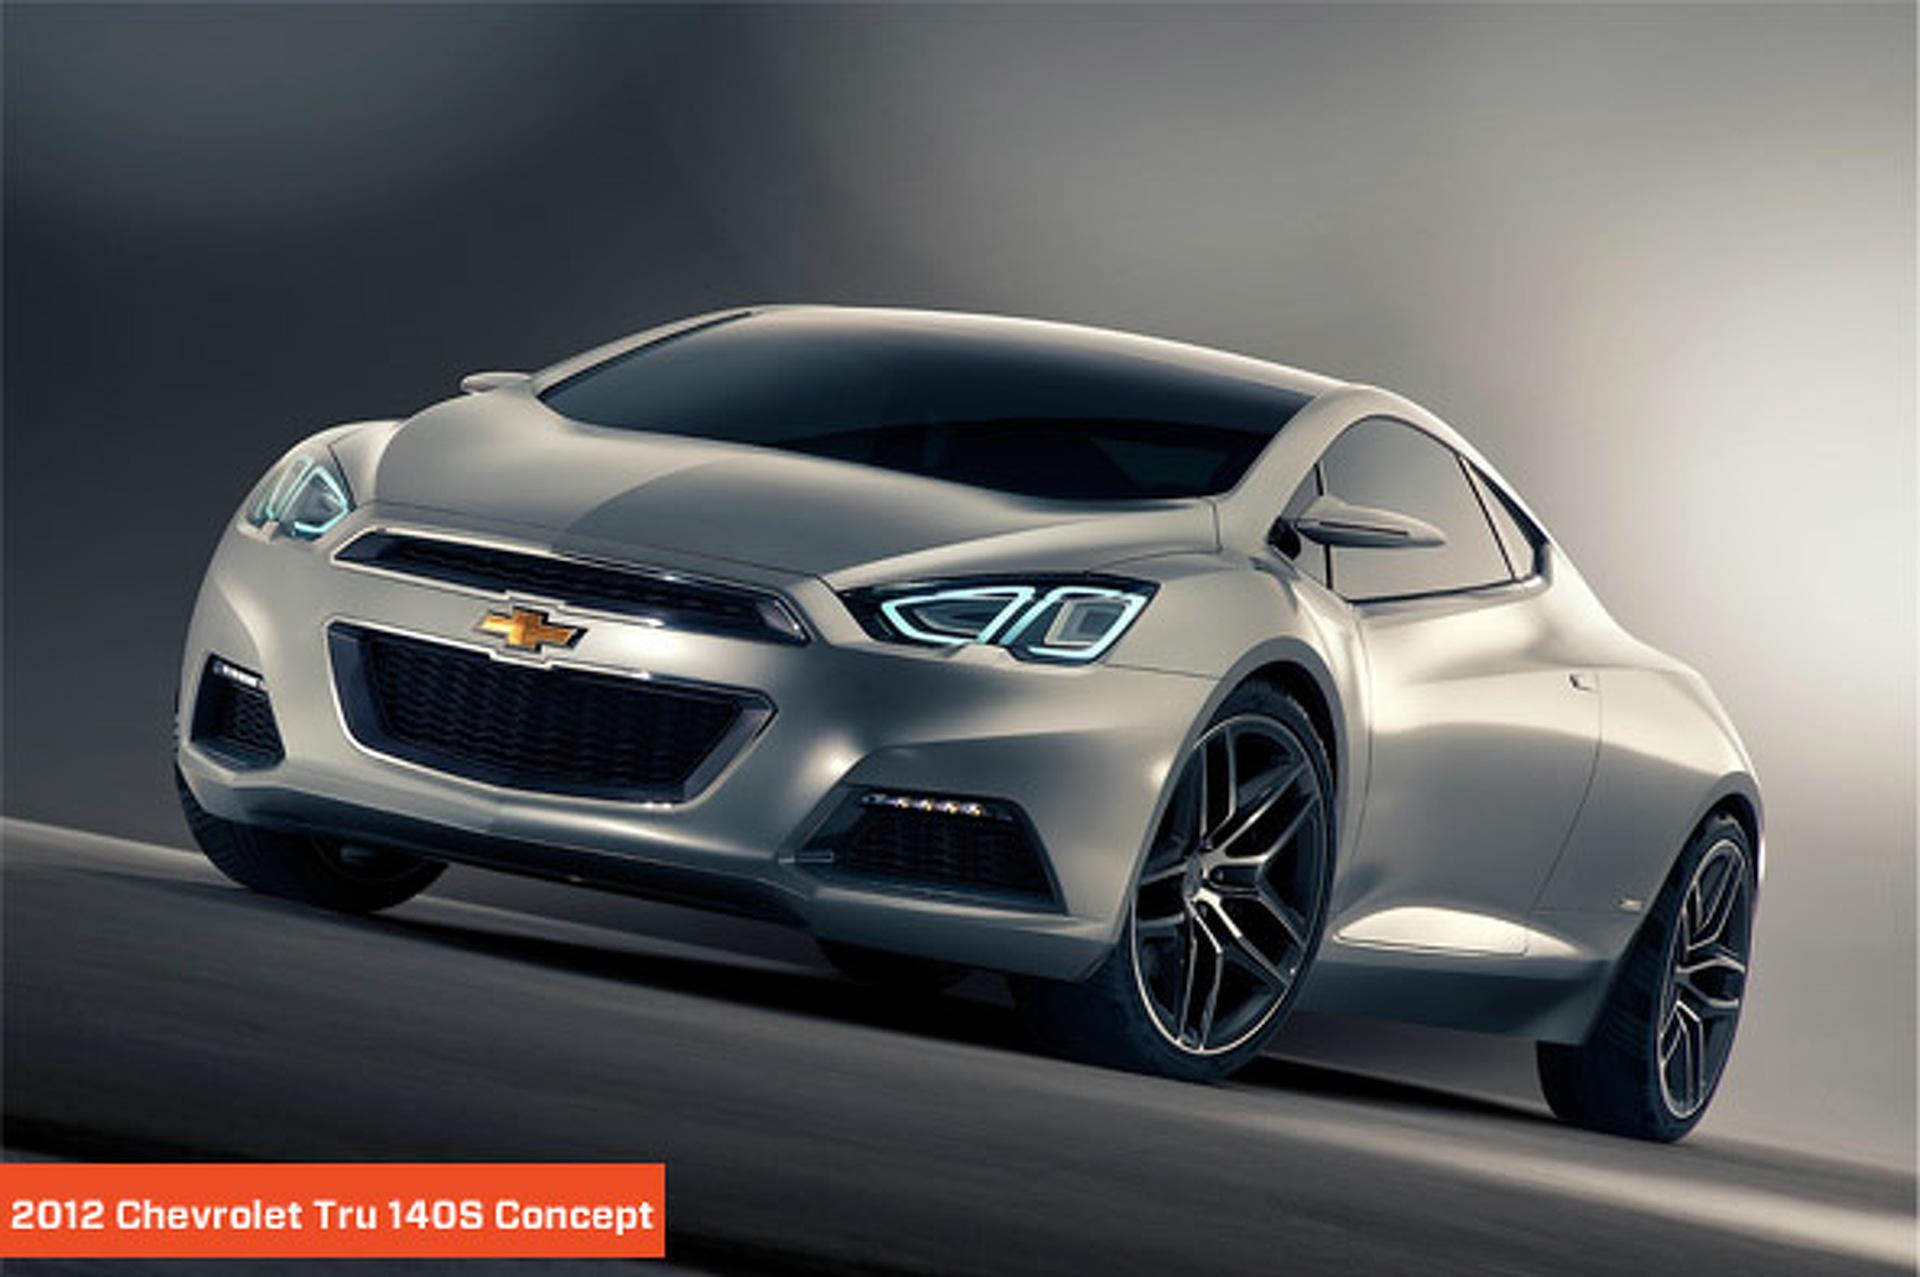 Future Rides: Chevrolet Tru 140S and Code 130R